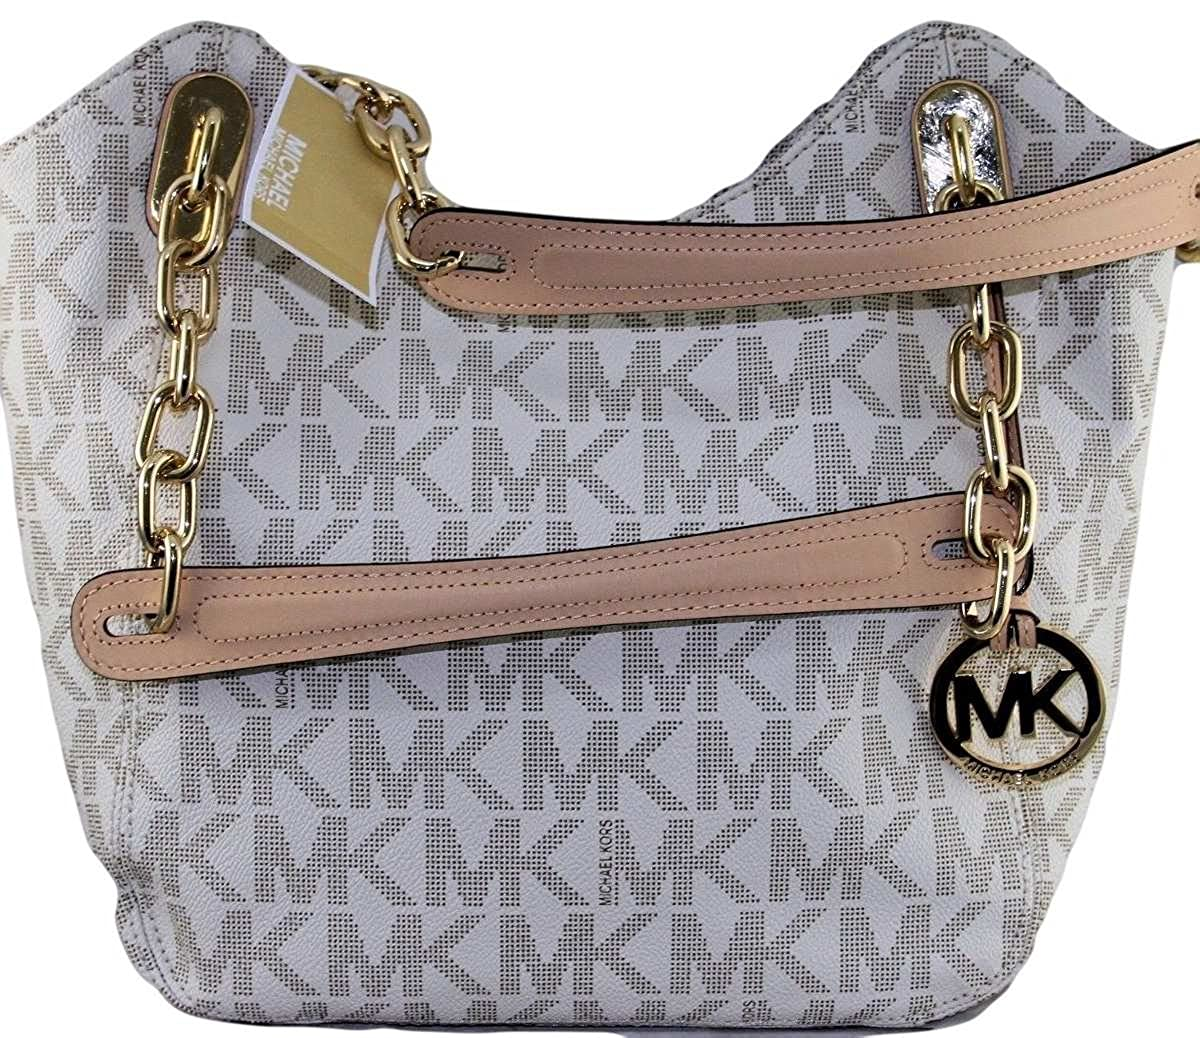 c7c616b69cfb ... where to buy michael kors md lilly pvc vanilla off white mk signature  chain tote handbag